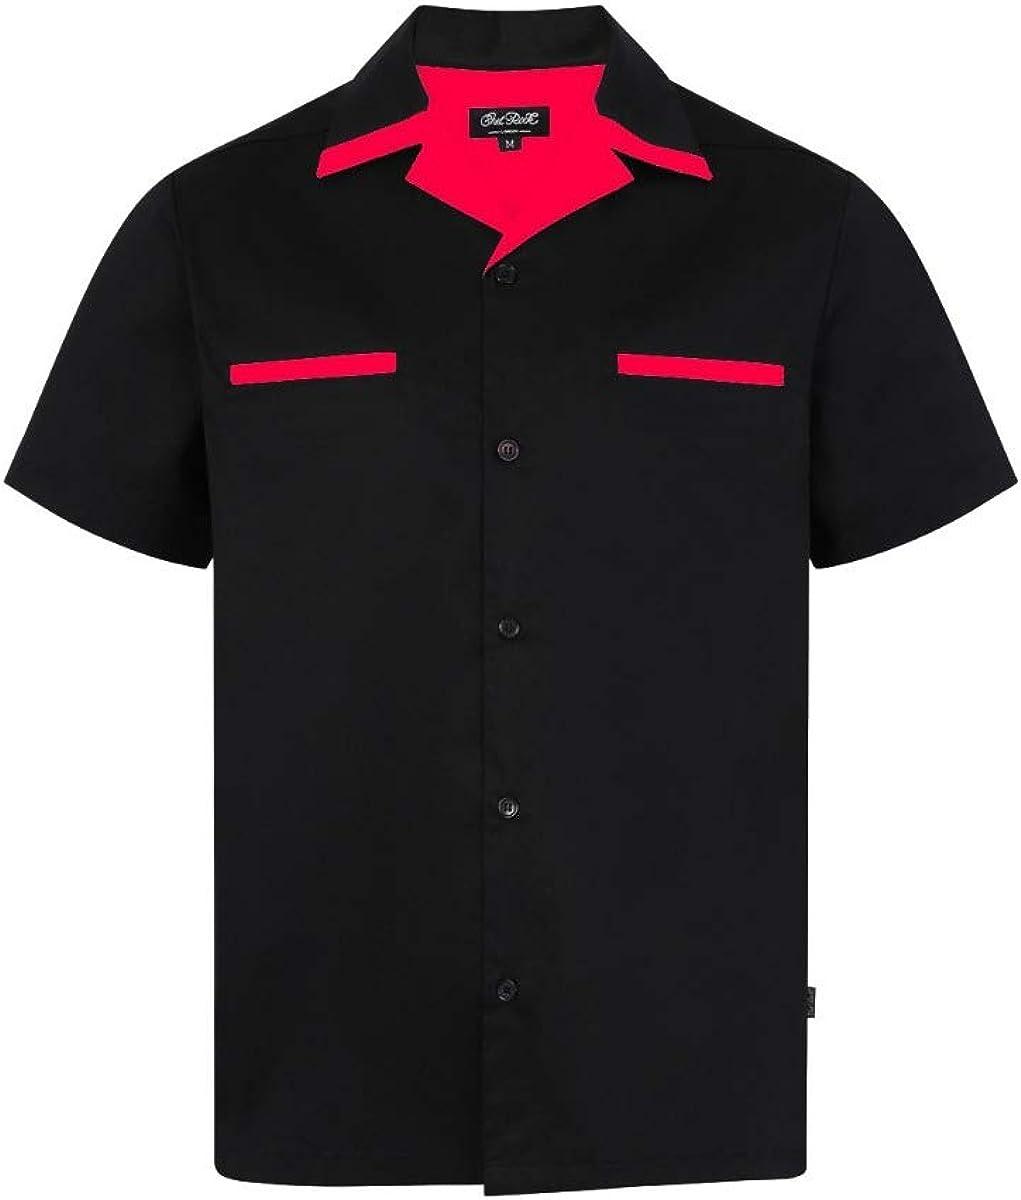 High order Chet Rock Spasm price Donnie Shirt Bowling